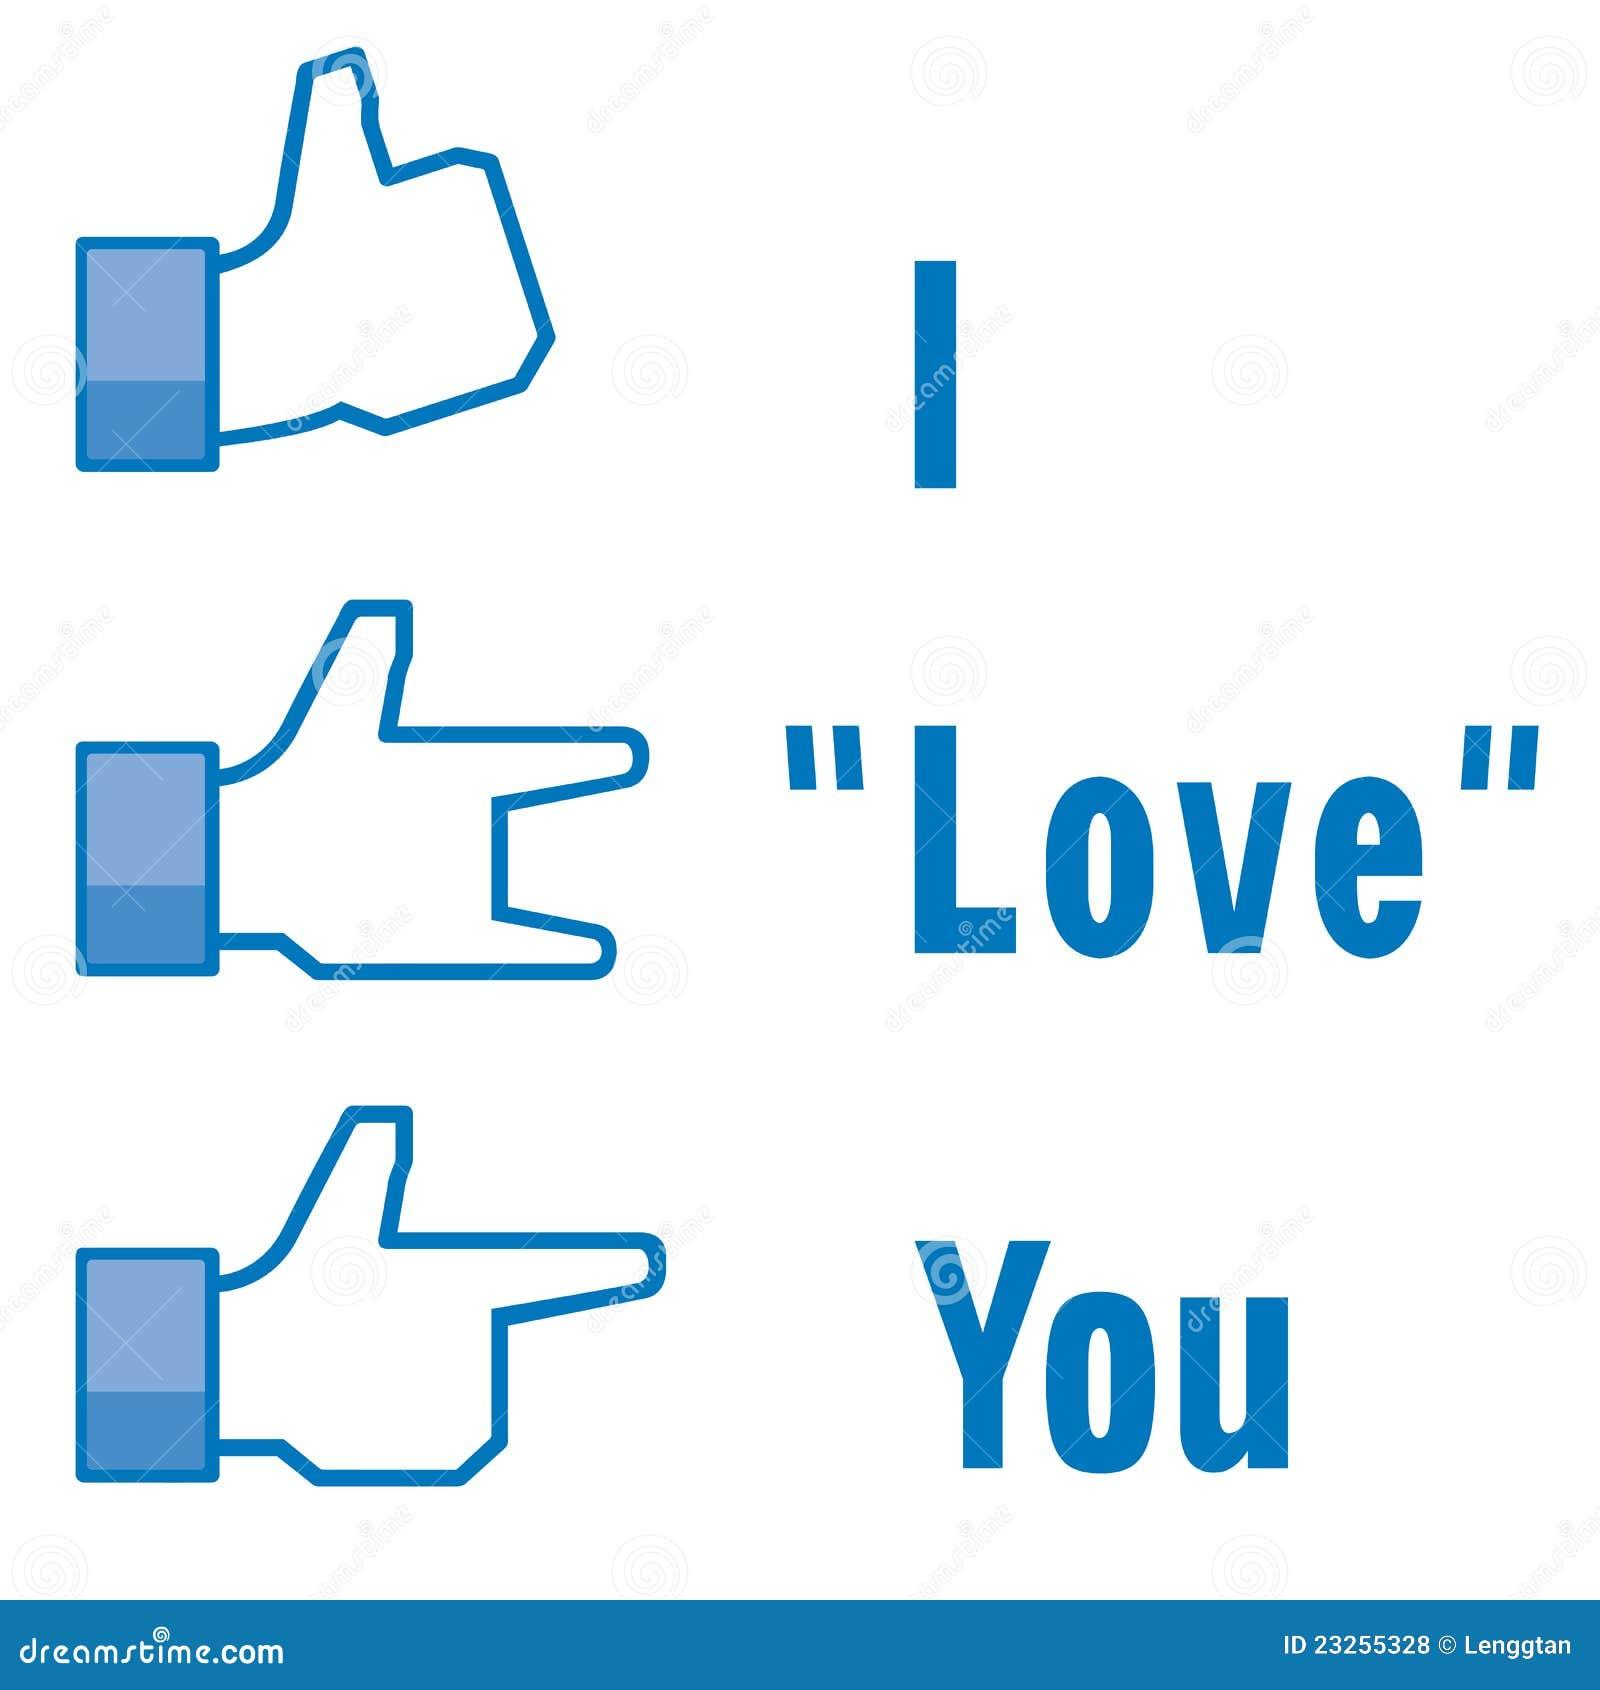 I Love You Symbols For Facebook Facebook Emoticons All Time Hit